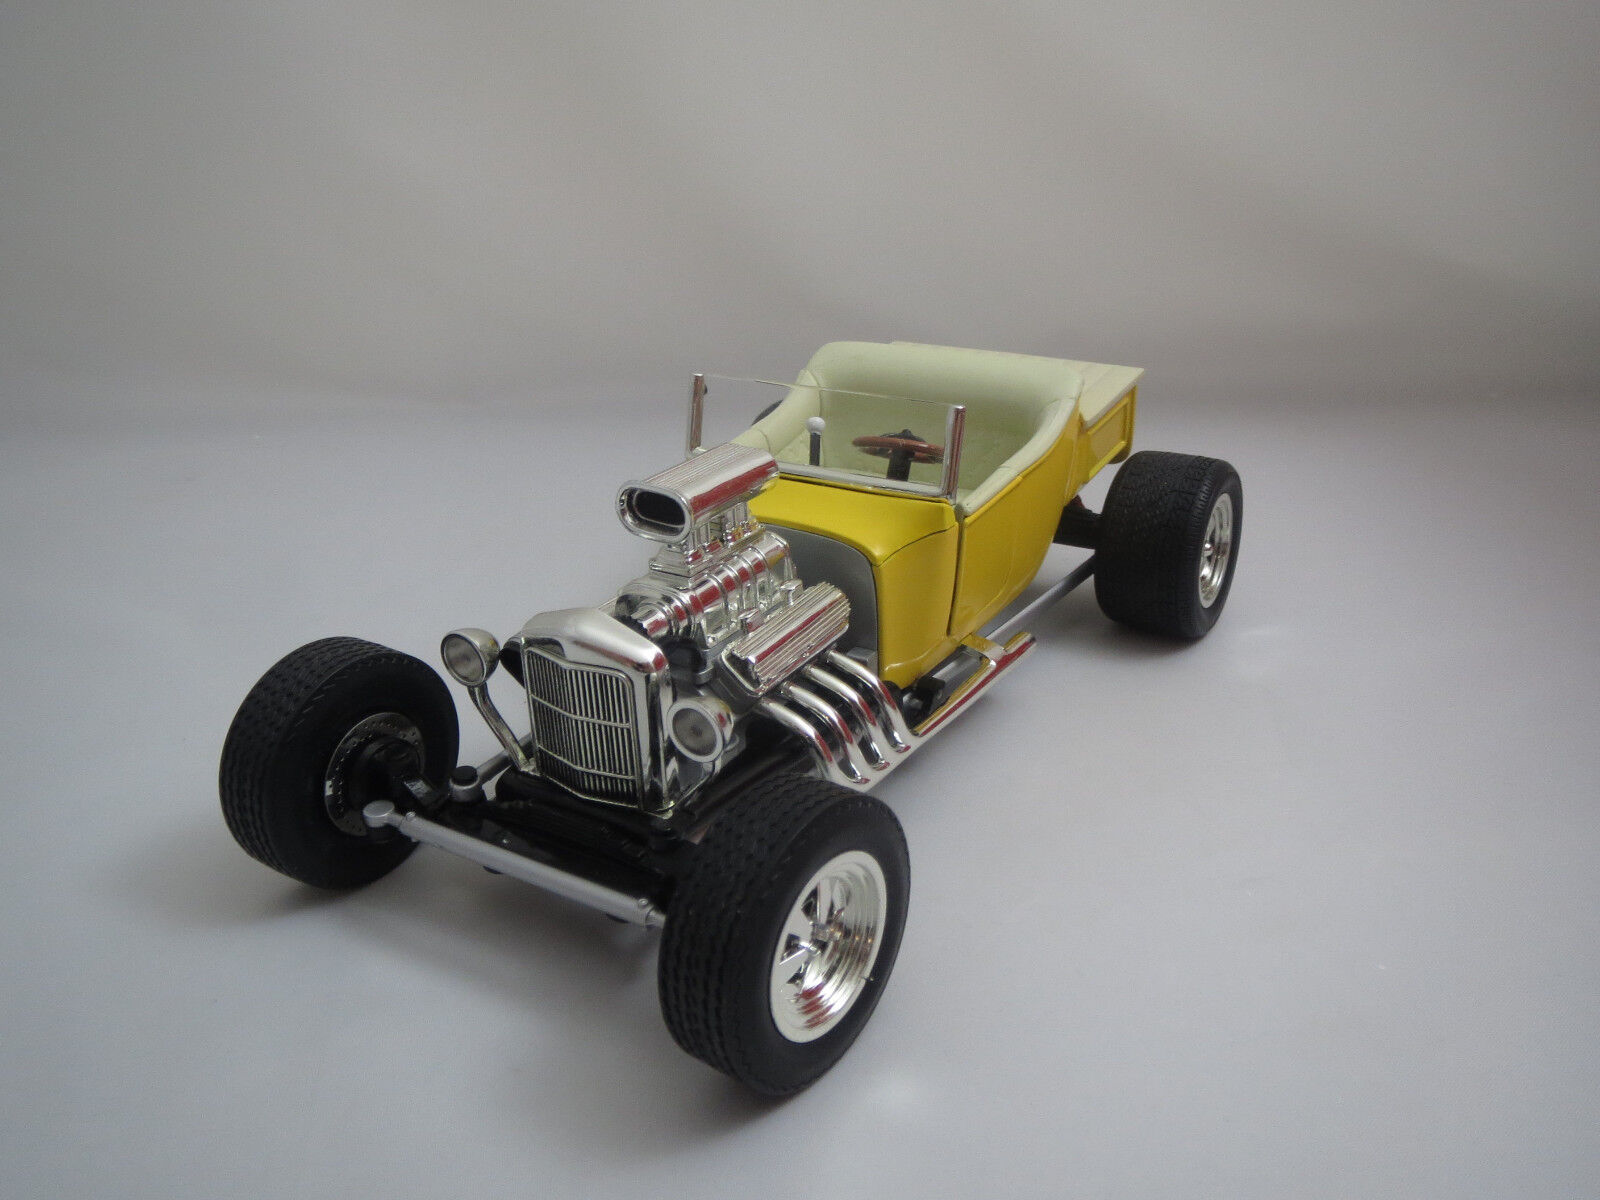 ERTL Racing Champions Ford  trademarks (jaune Cream blanc) 1 18 without VP.  pas cher en ligne